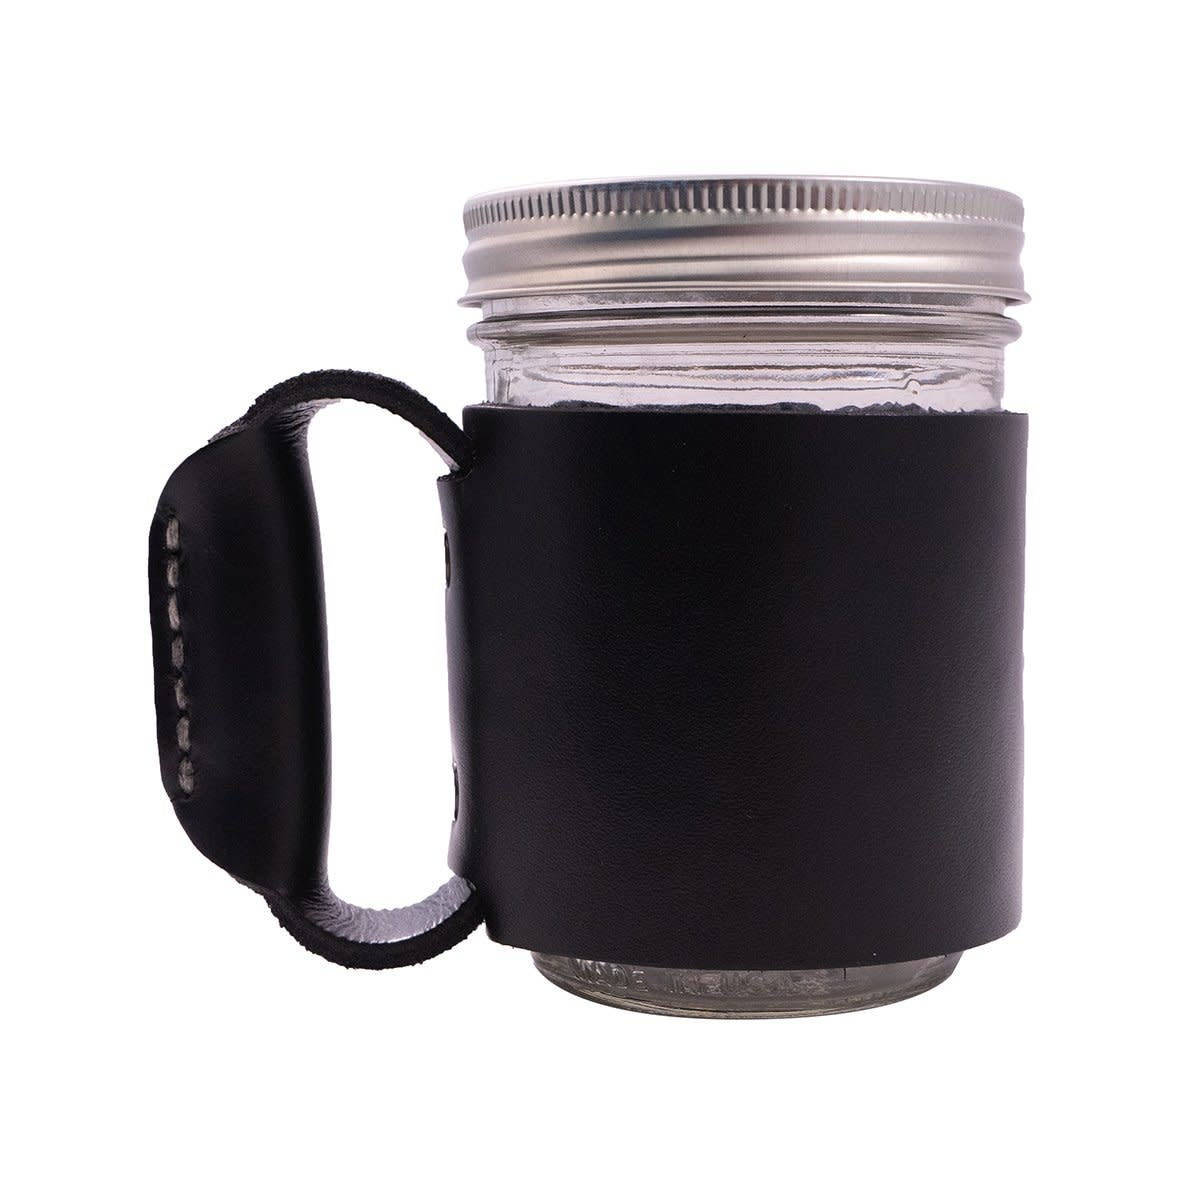 Rustico Miner Mug Onyx